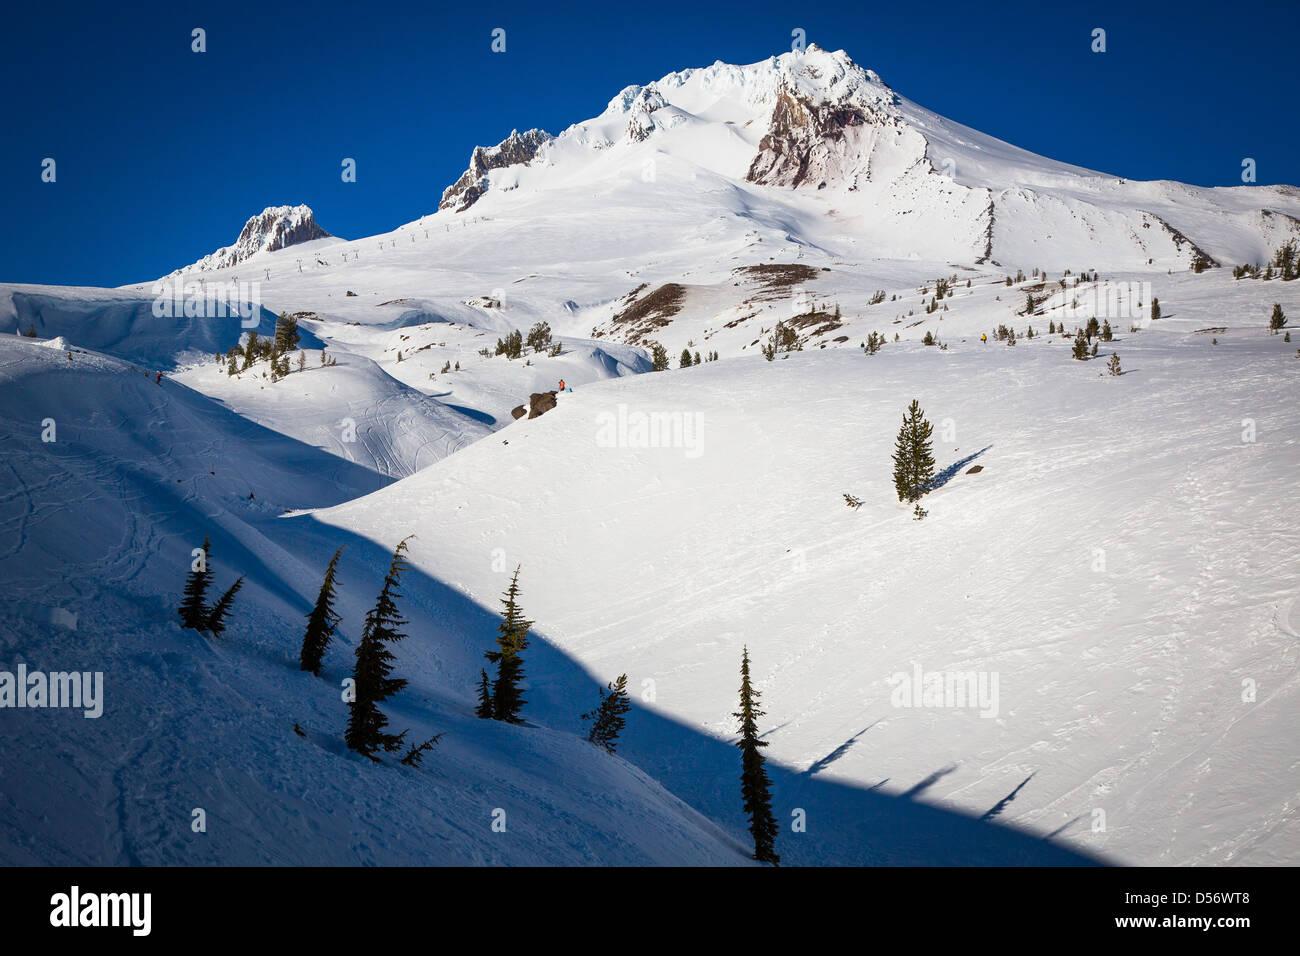 Mount Hood, Oregon, in winter - Stock Image